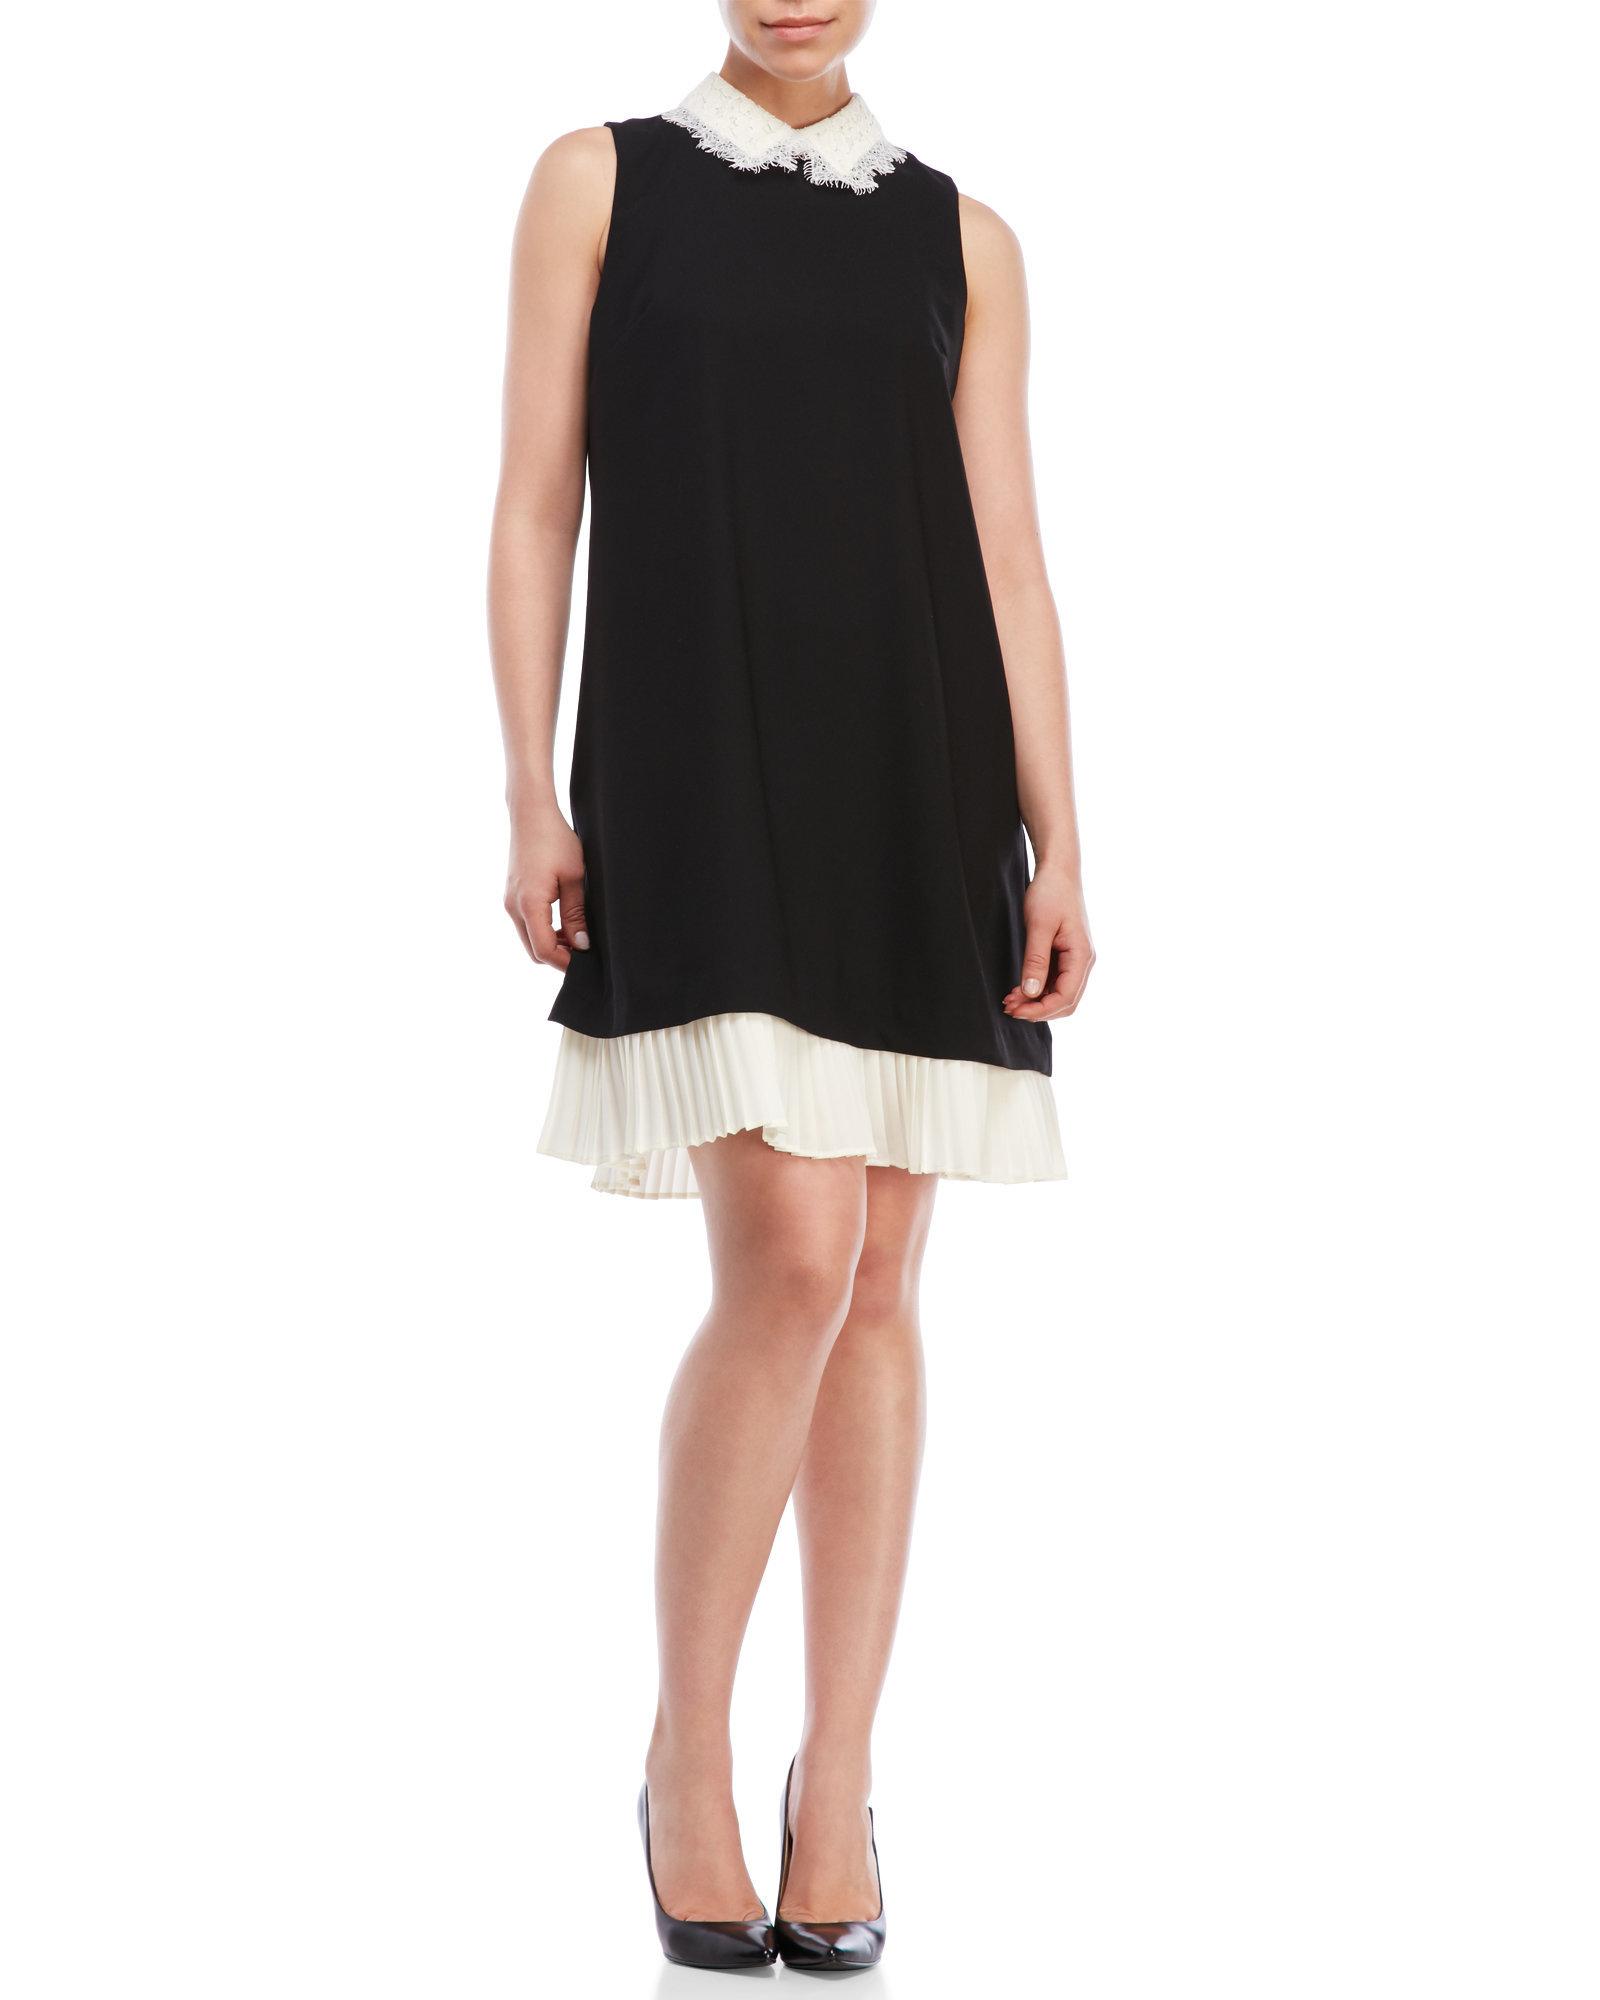 828b6aeef4d76 Nanette Lepore Pleated Hem Shift Dress in Black - Lyst